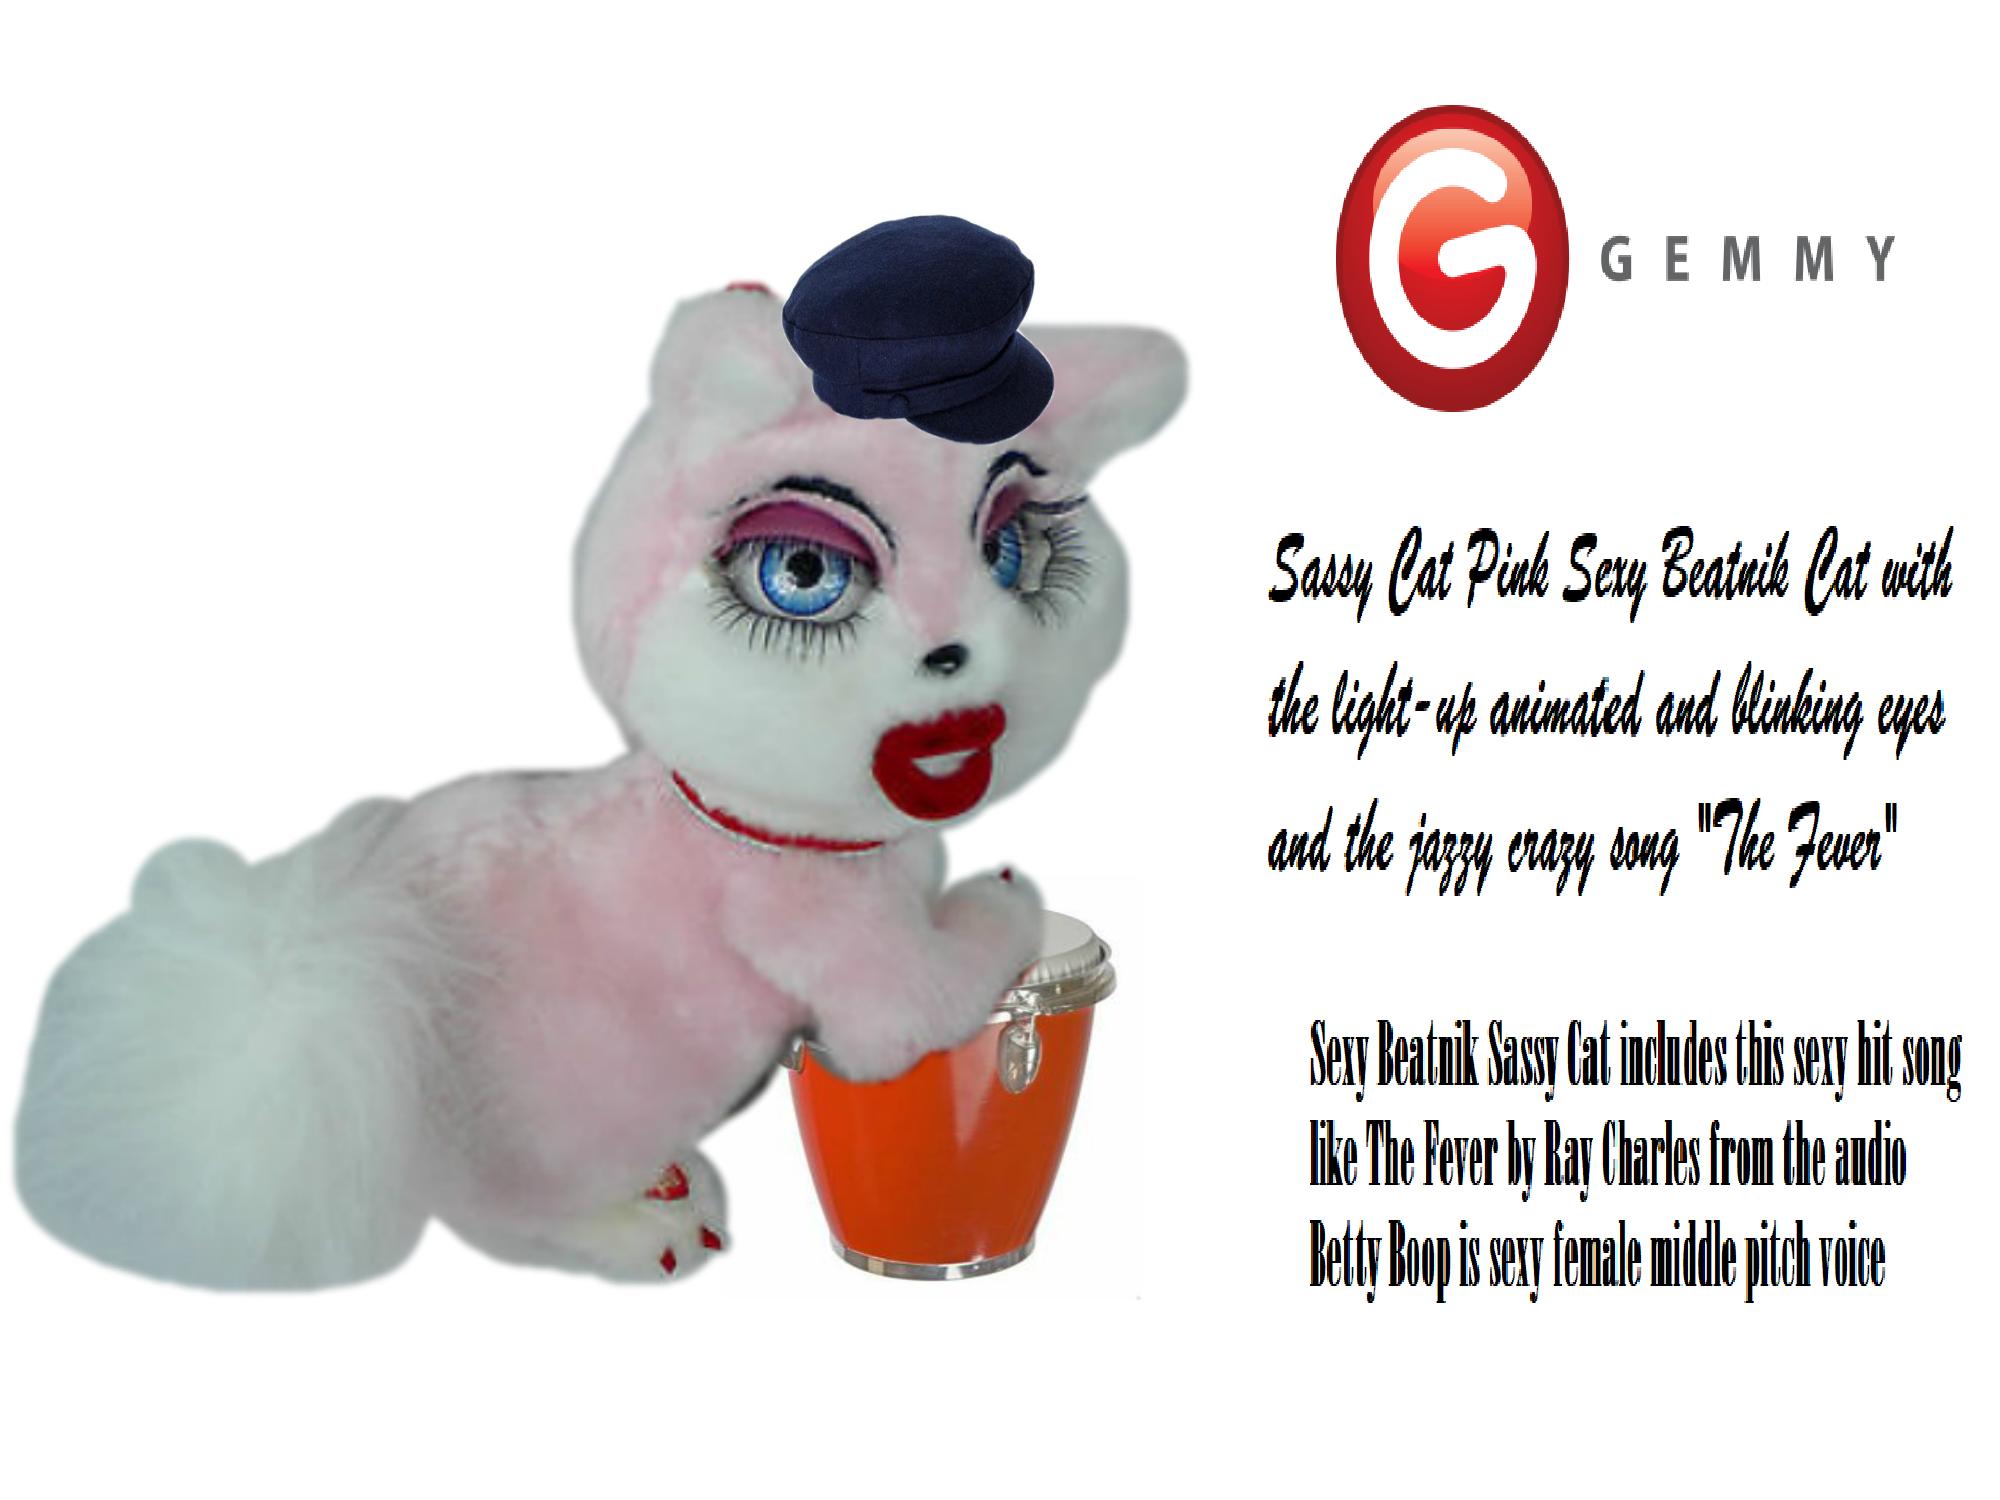 Gemmy Industries (2004) - Singing Sexy Beatnik Female Sassy